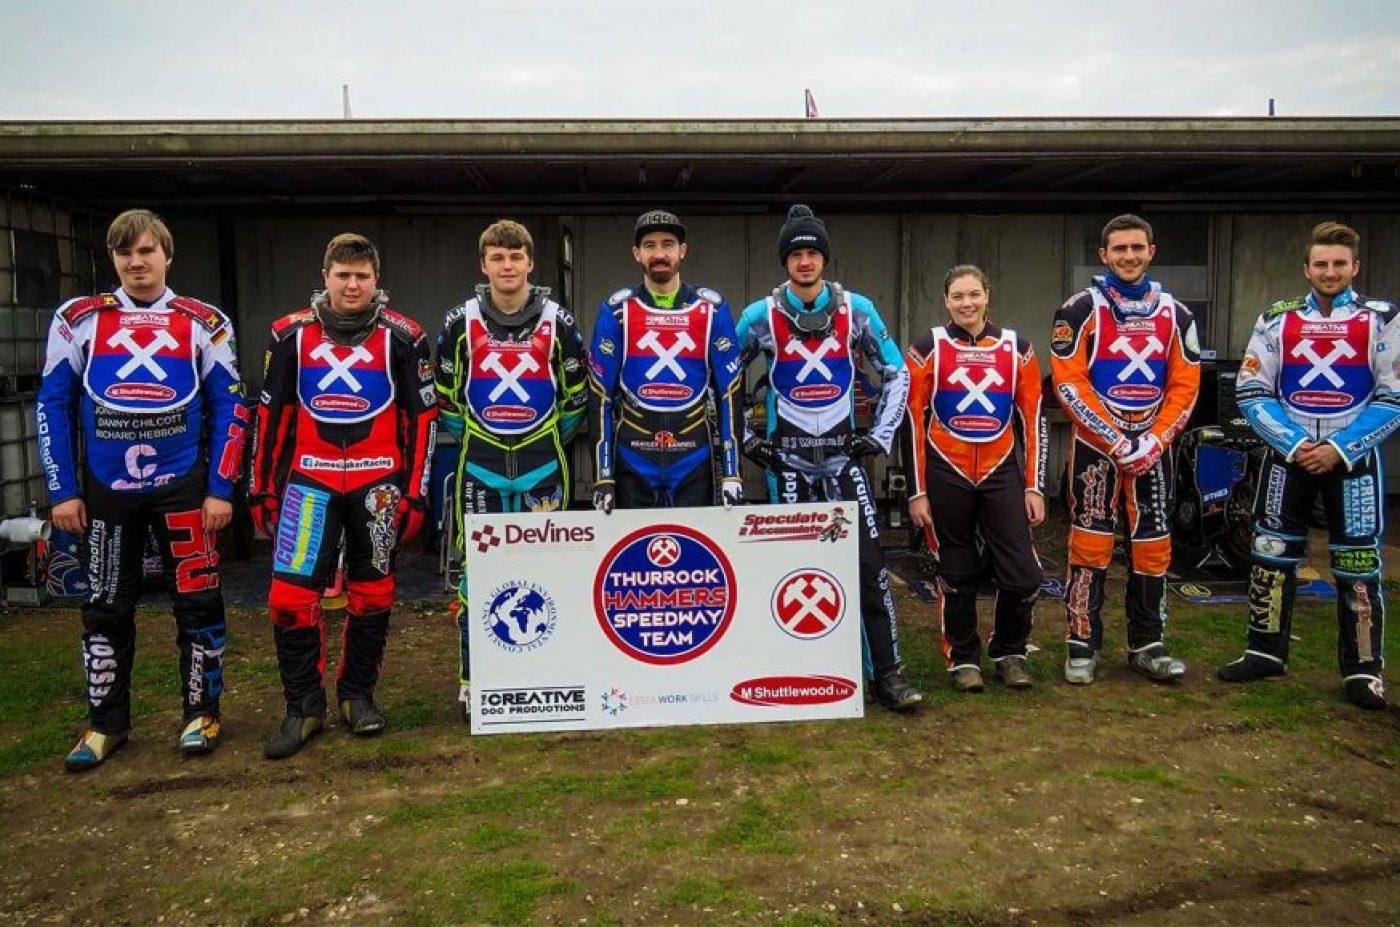 Thurrock-Hammers-Speedway-Team